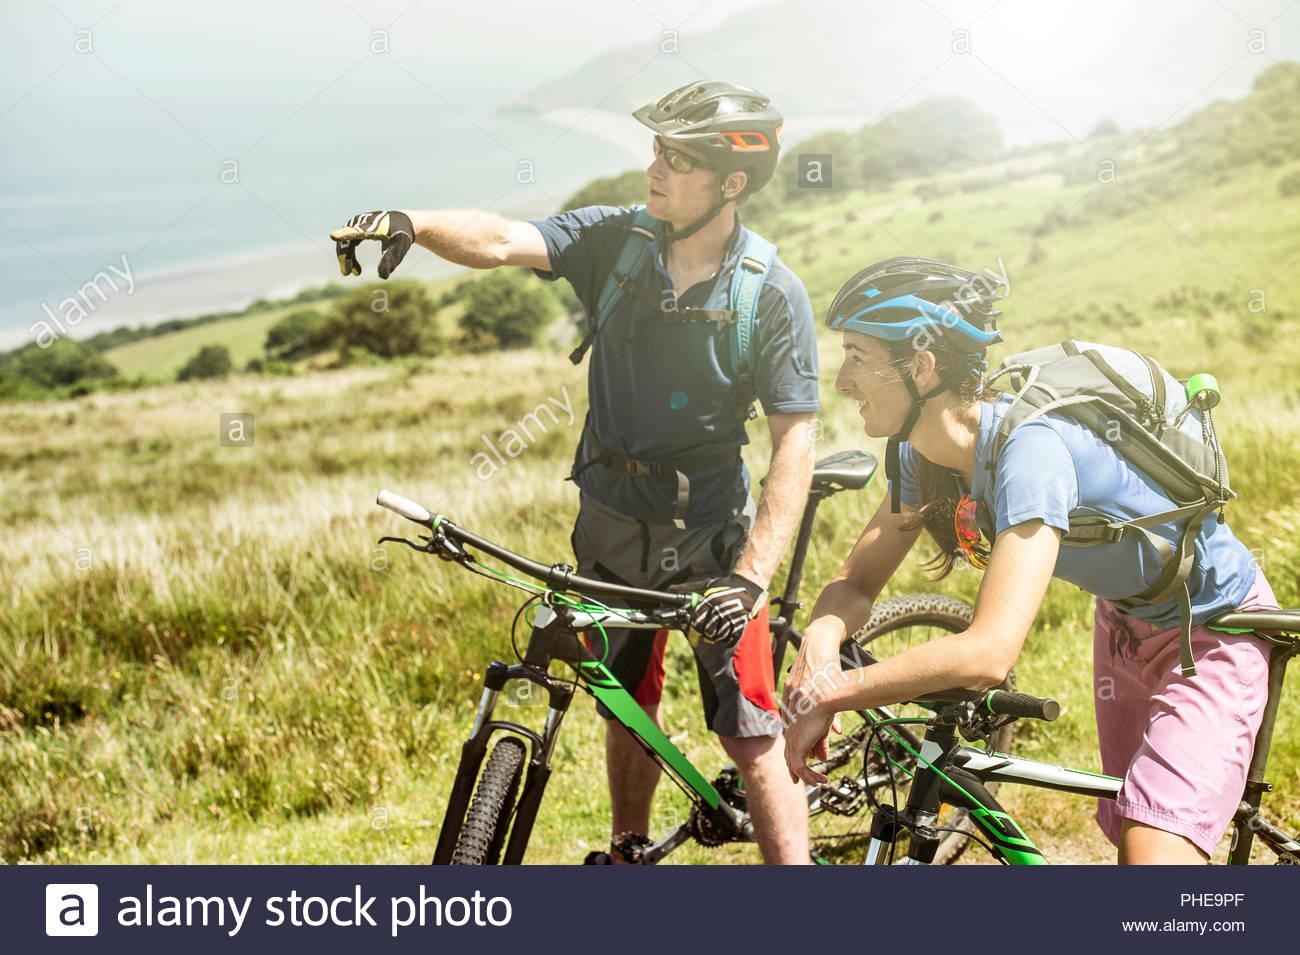 Par llevar cascos de bicicleta en la colina de Porlock Weir, Inglaterra Imagen De Stock